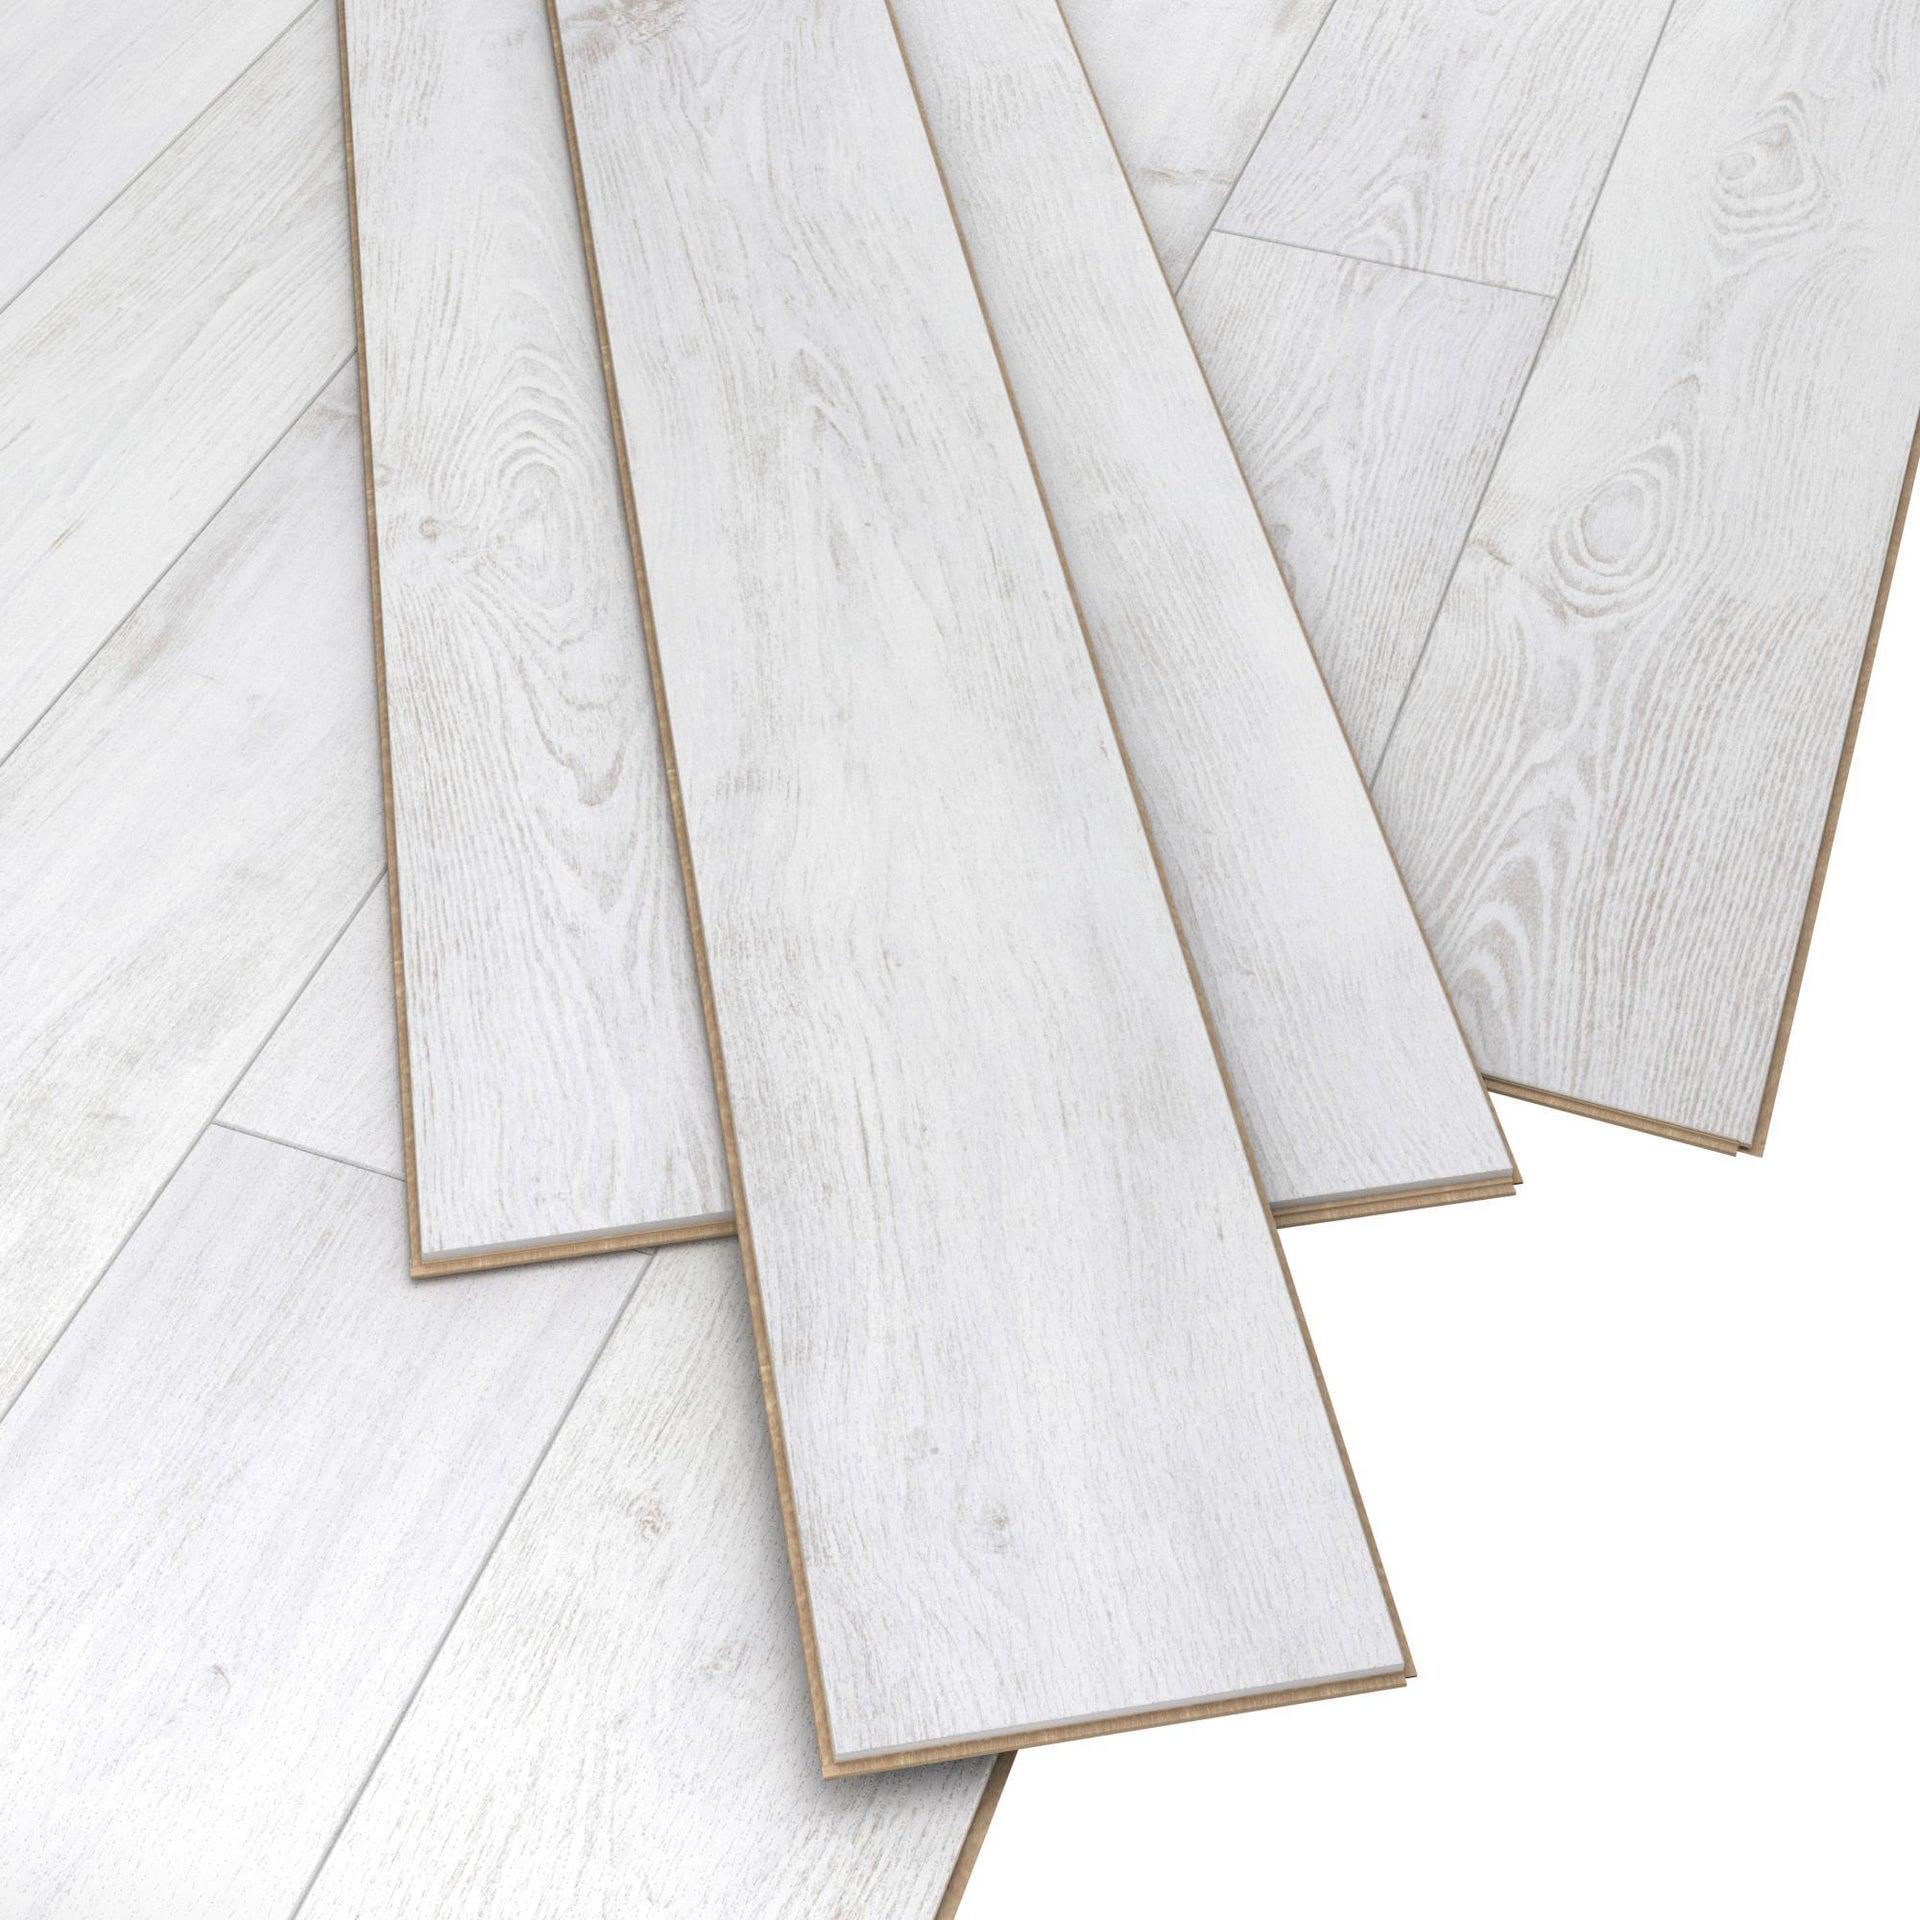 Pavimento laminato Nuiza Sp 8 mm beige - 4